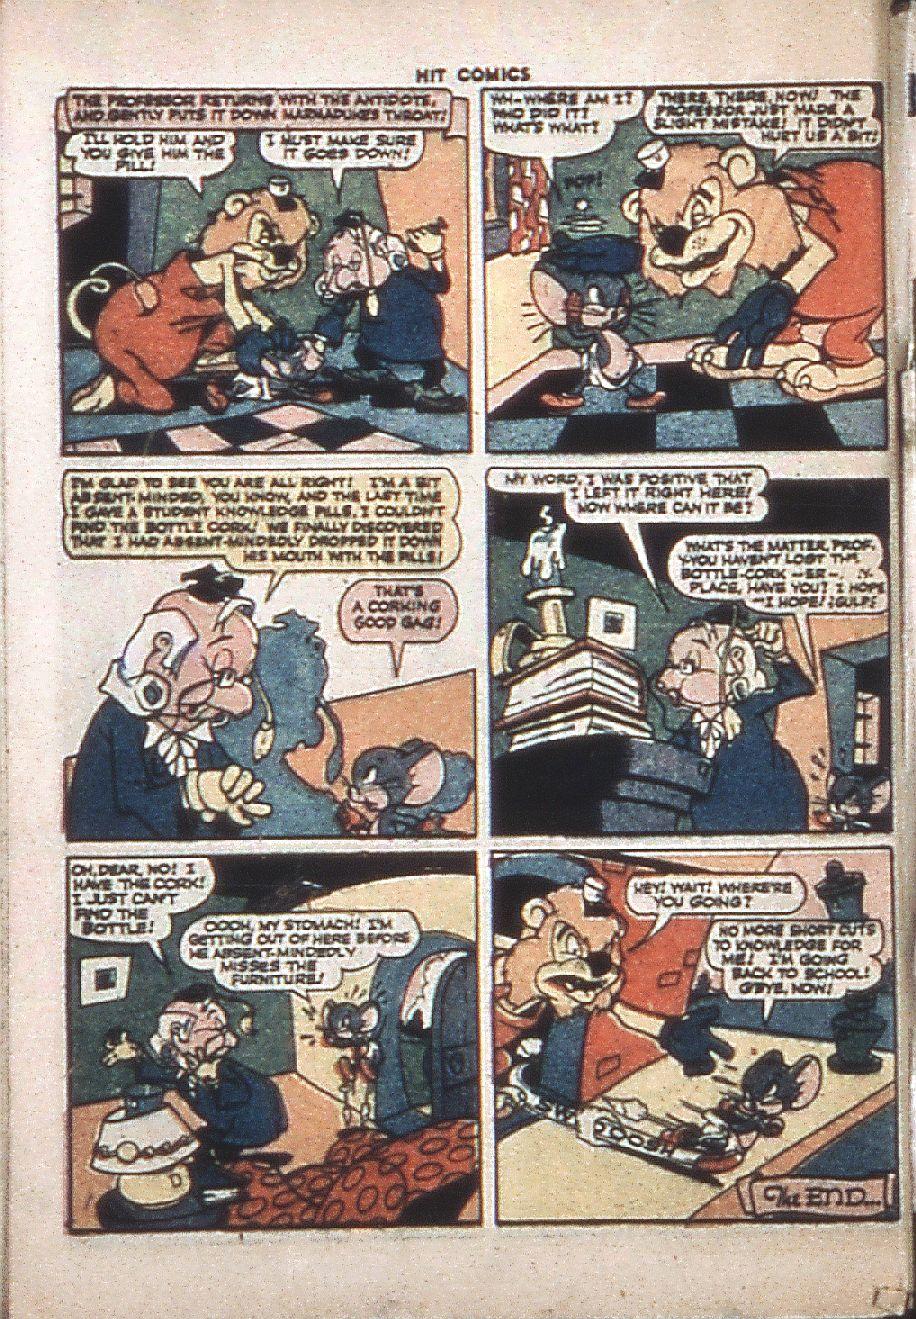 Read online Hit Comics comic -  Issue #37 - 58